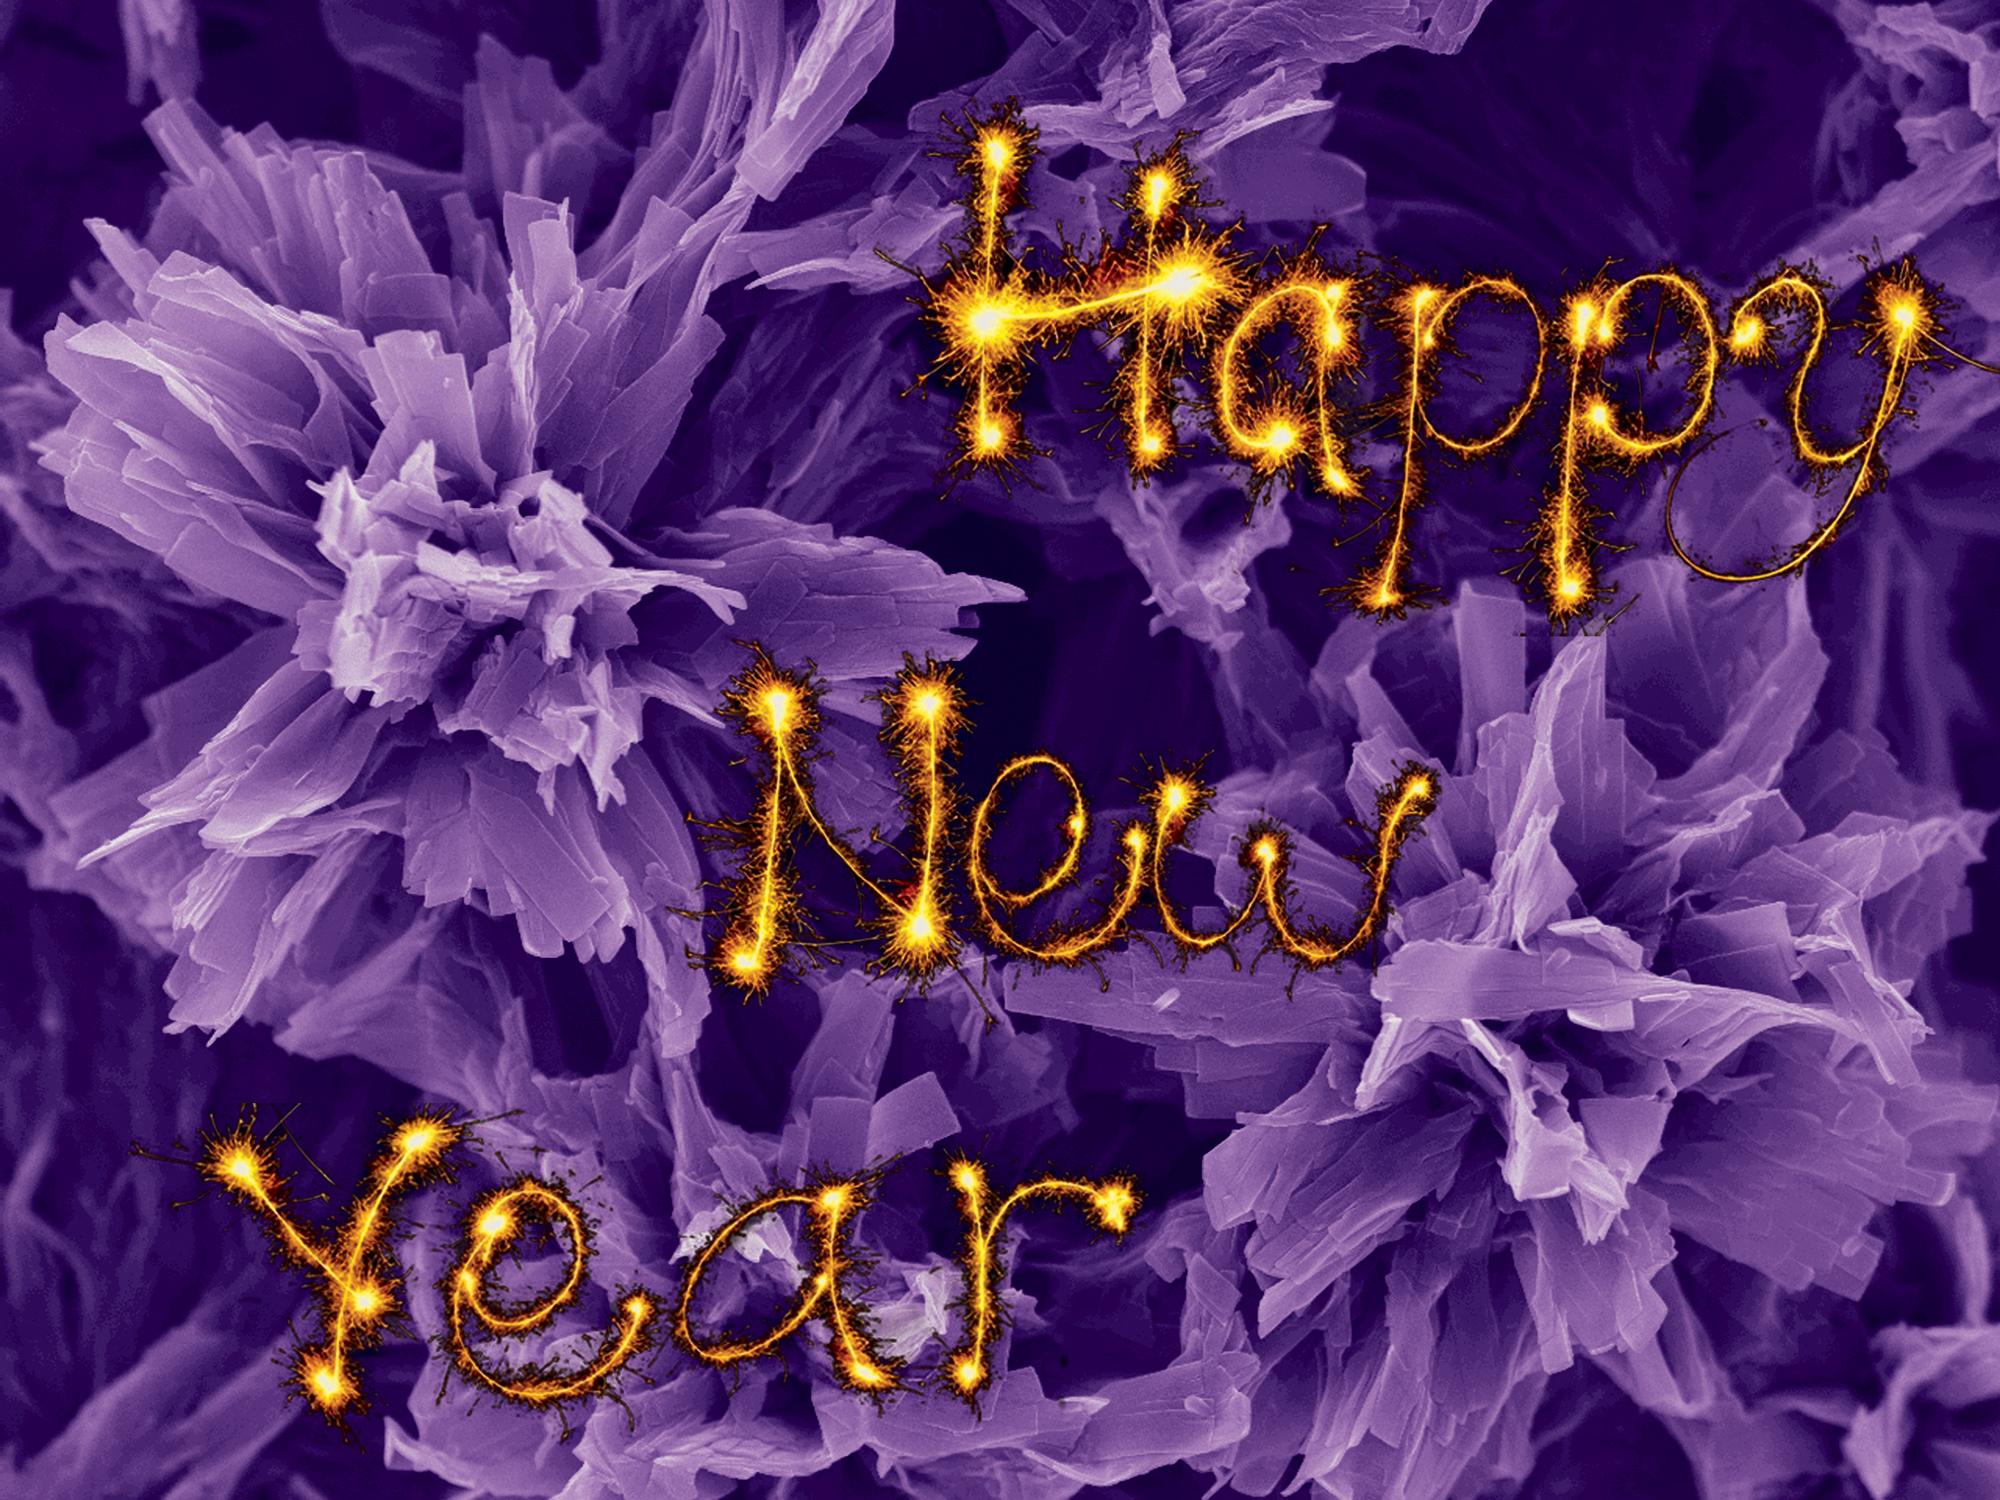 7. Happy New Year